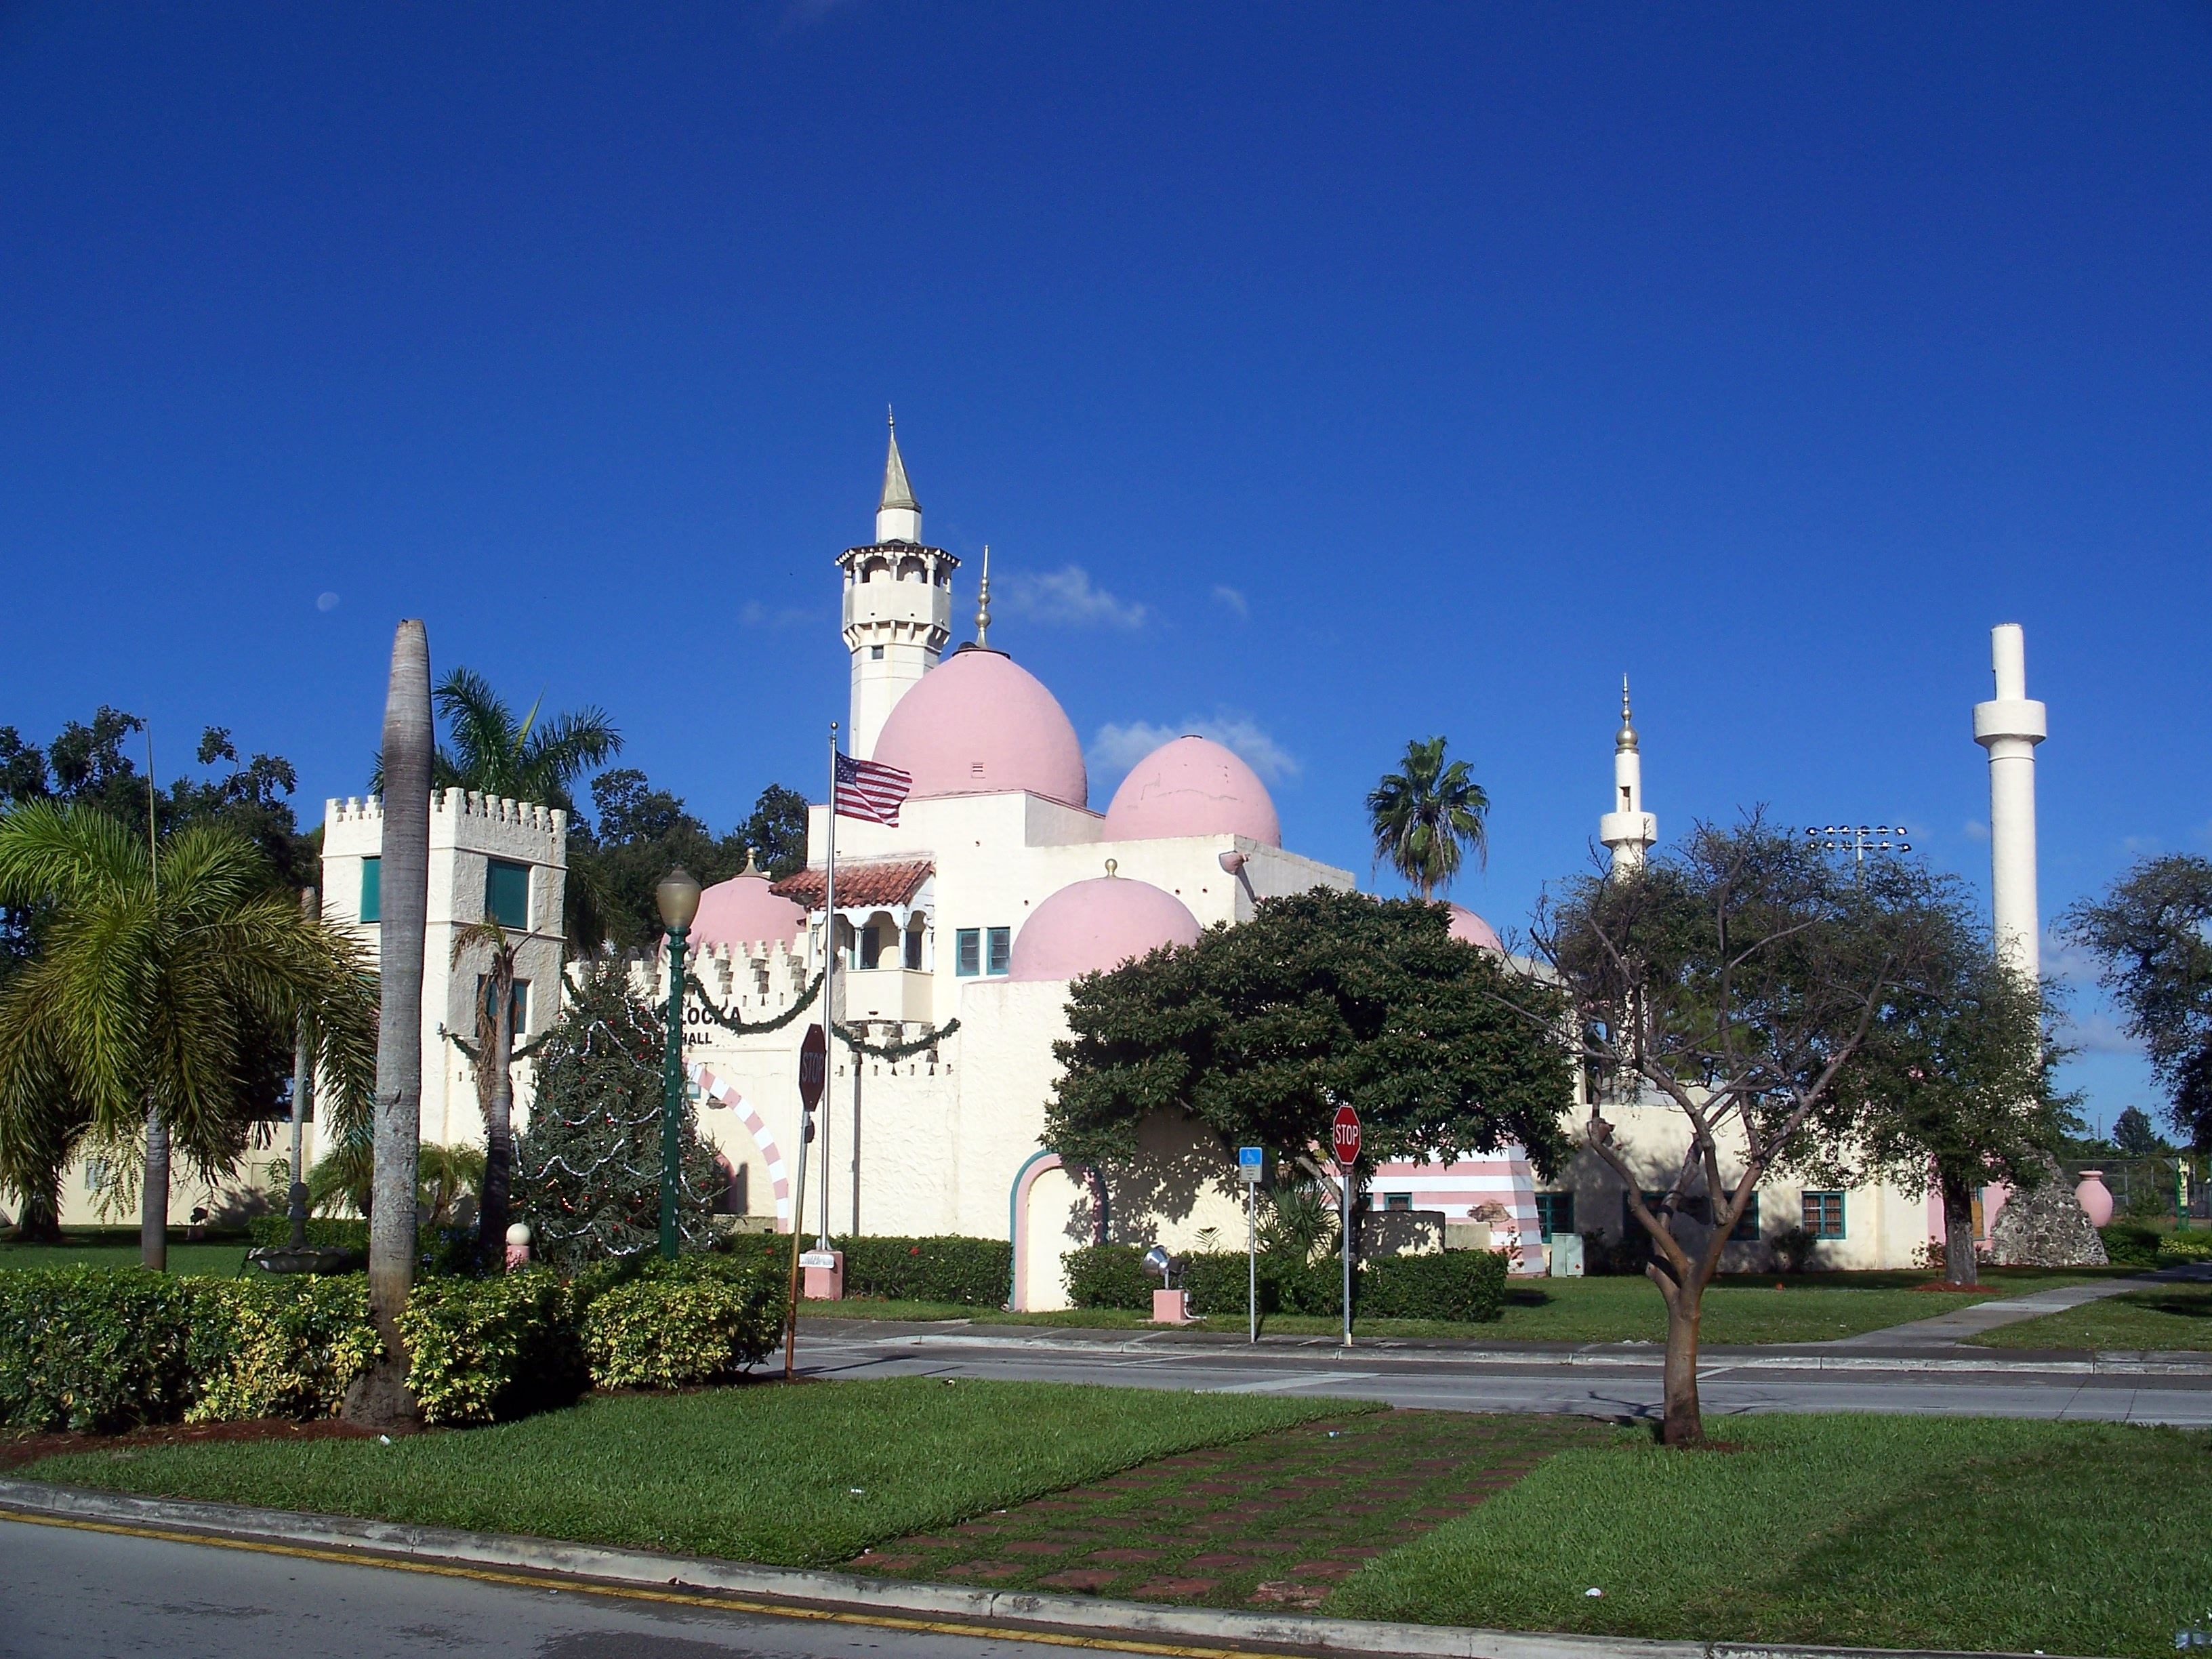 Opa Locka City Hall File:opa Locka fl City Hall01